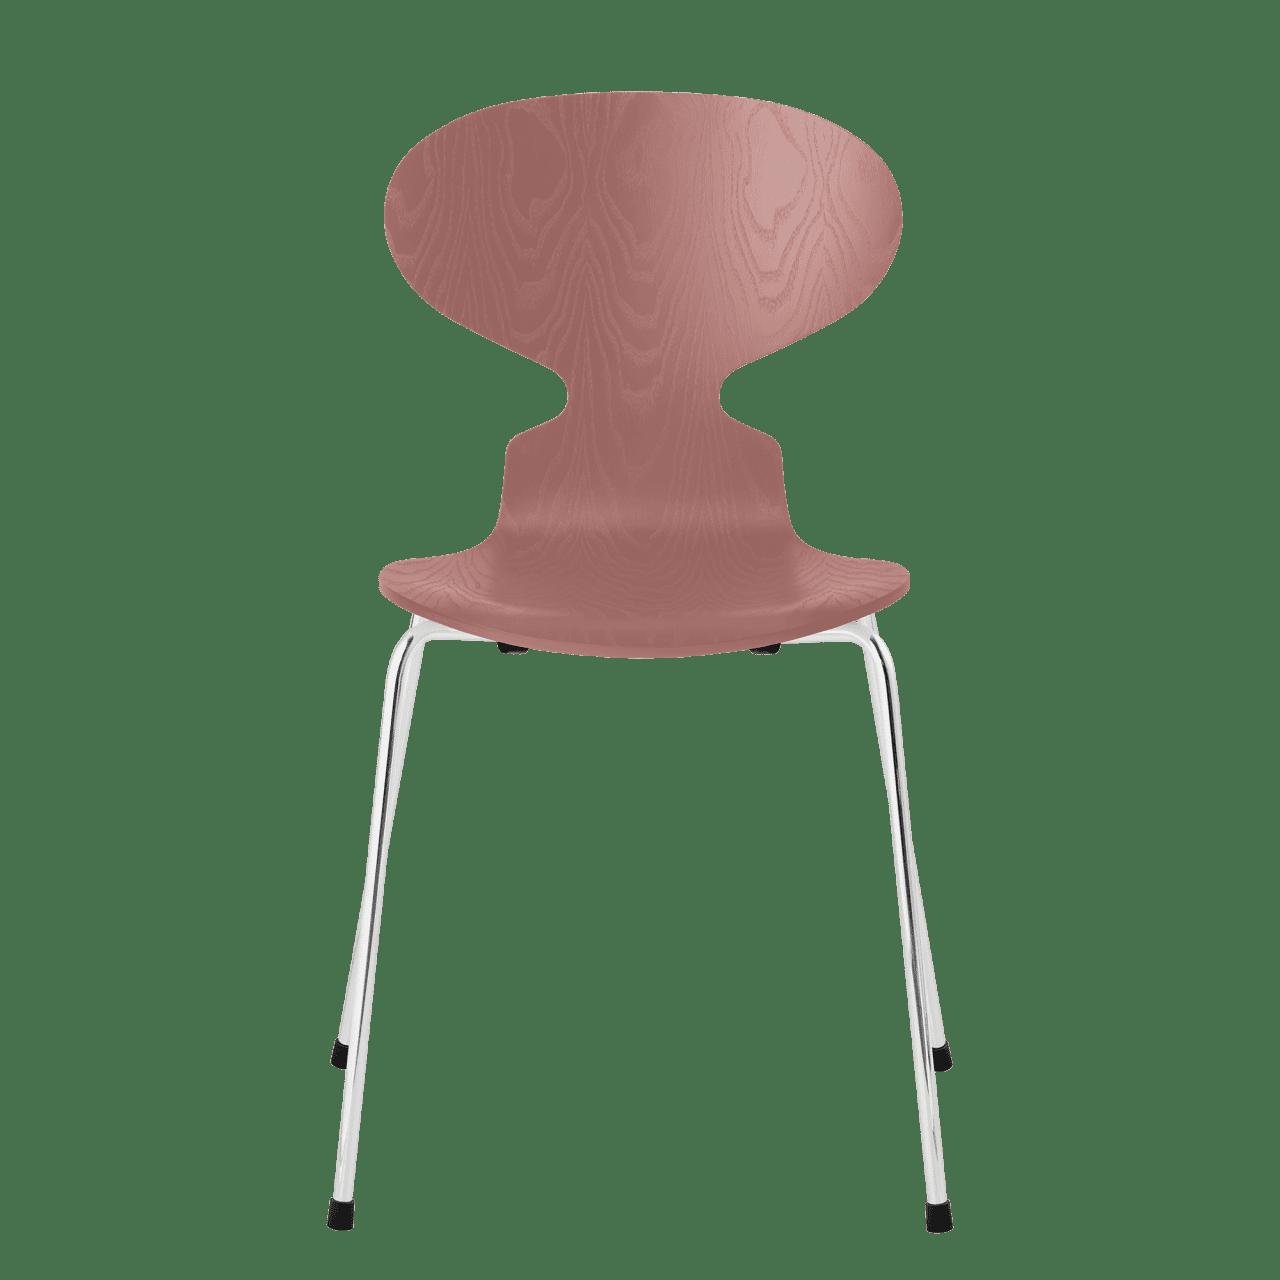 3101 Ameise Stuhl farbig